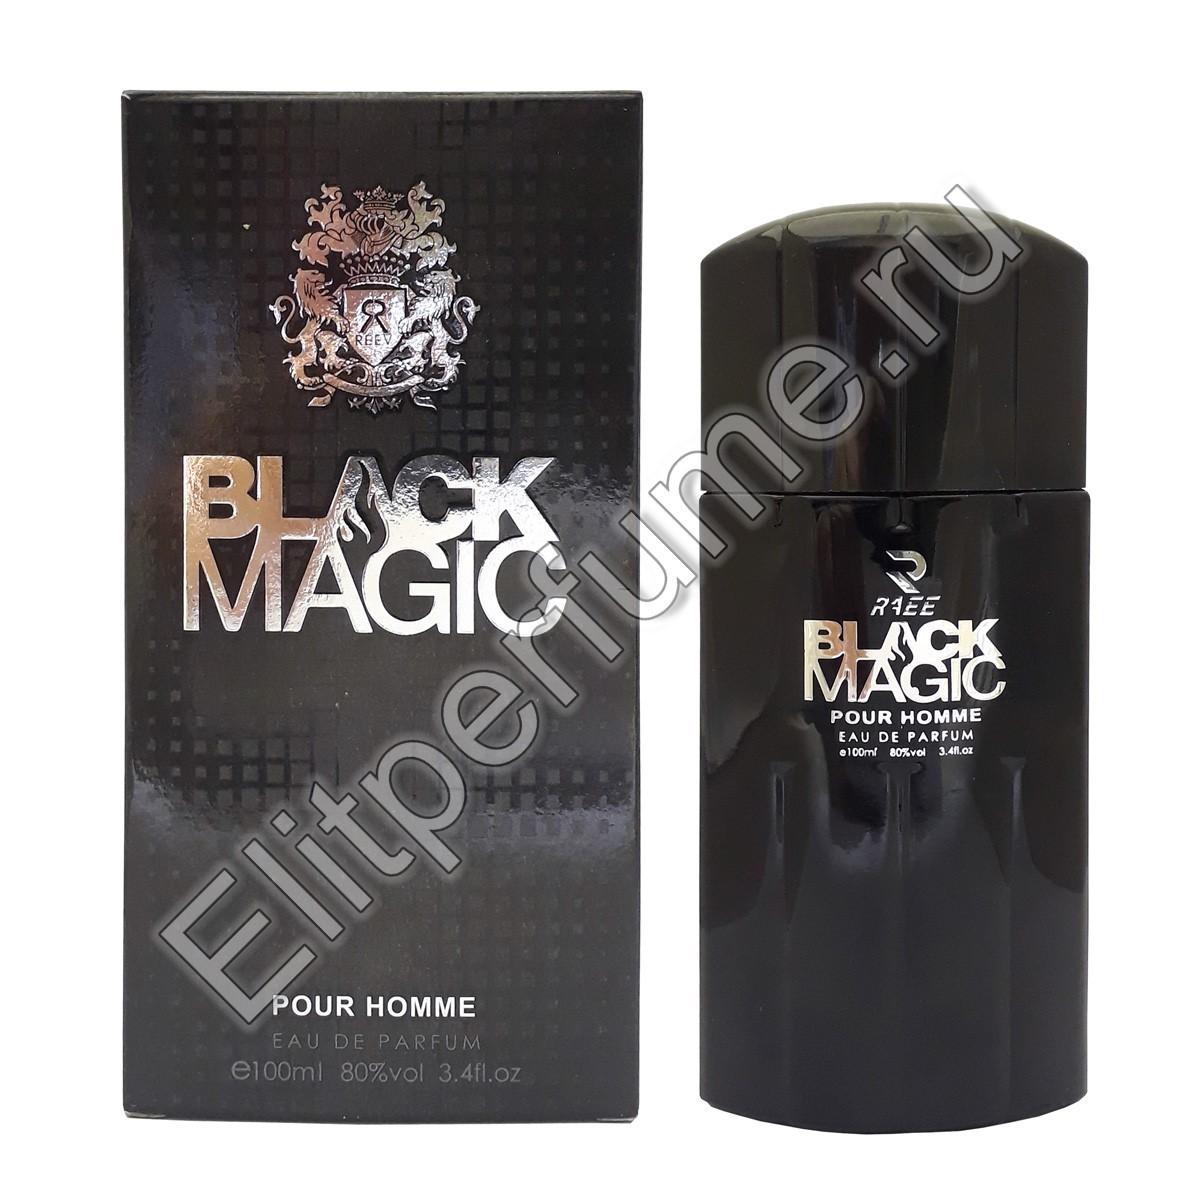 Black Magic Pour Homme 100 мл спрей от Reev Khalis Perfumes Халис